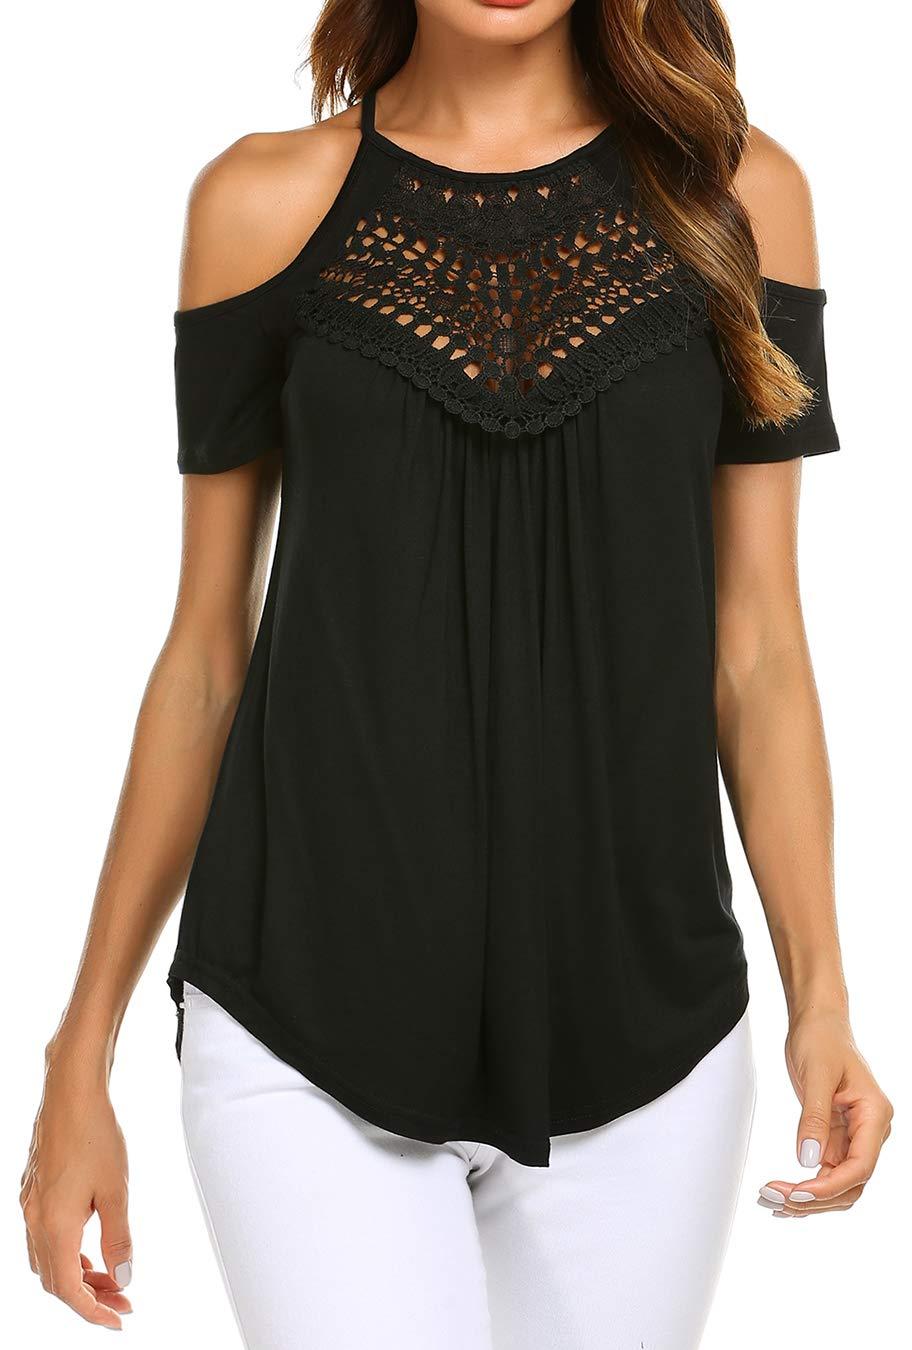 Women Casual Off Shoulder T Shirts Short Sleeve Spaghetti Straps Tunic Tops Black XL